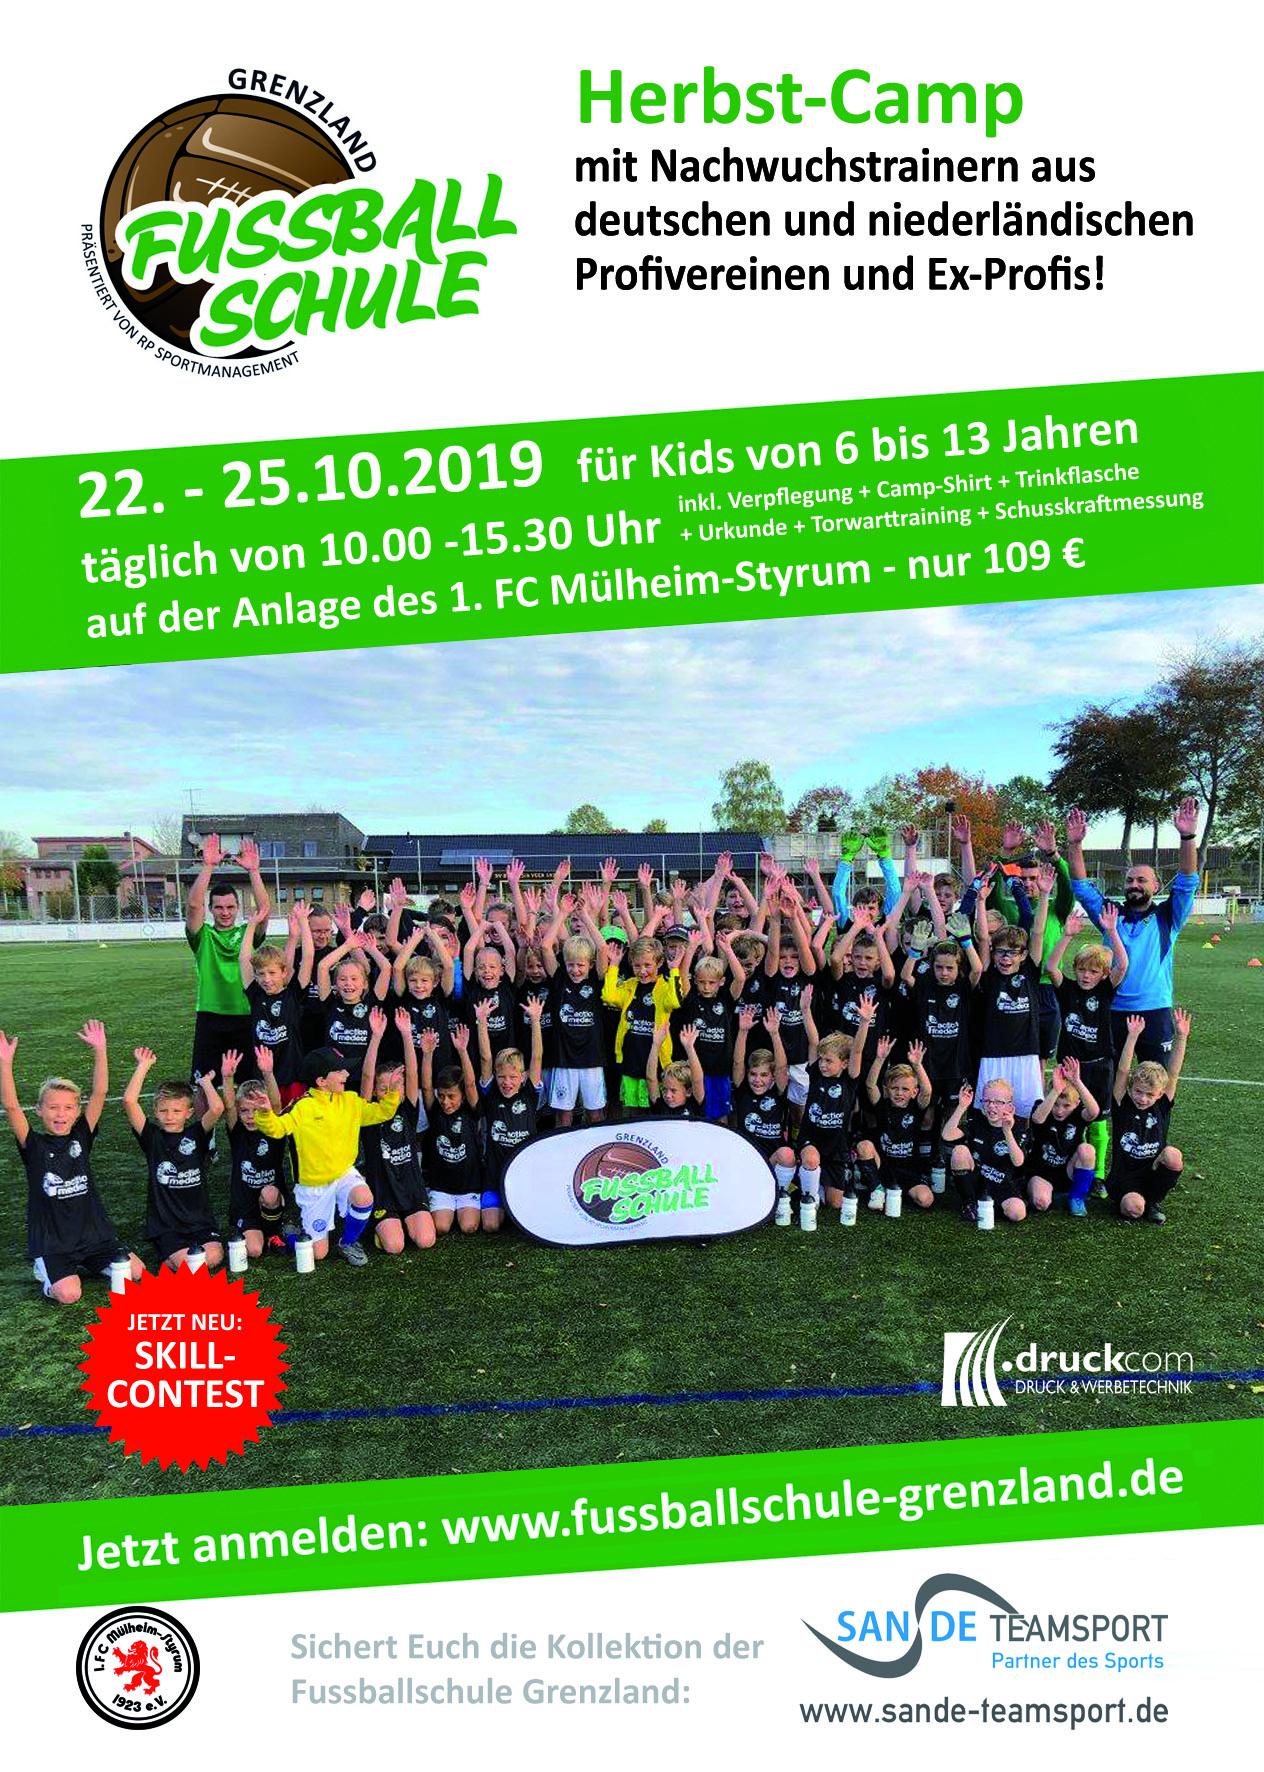 Fußballcamp an der Moritzstraße